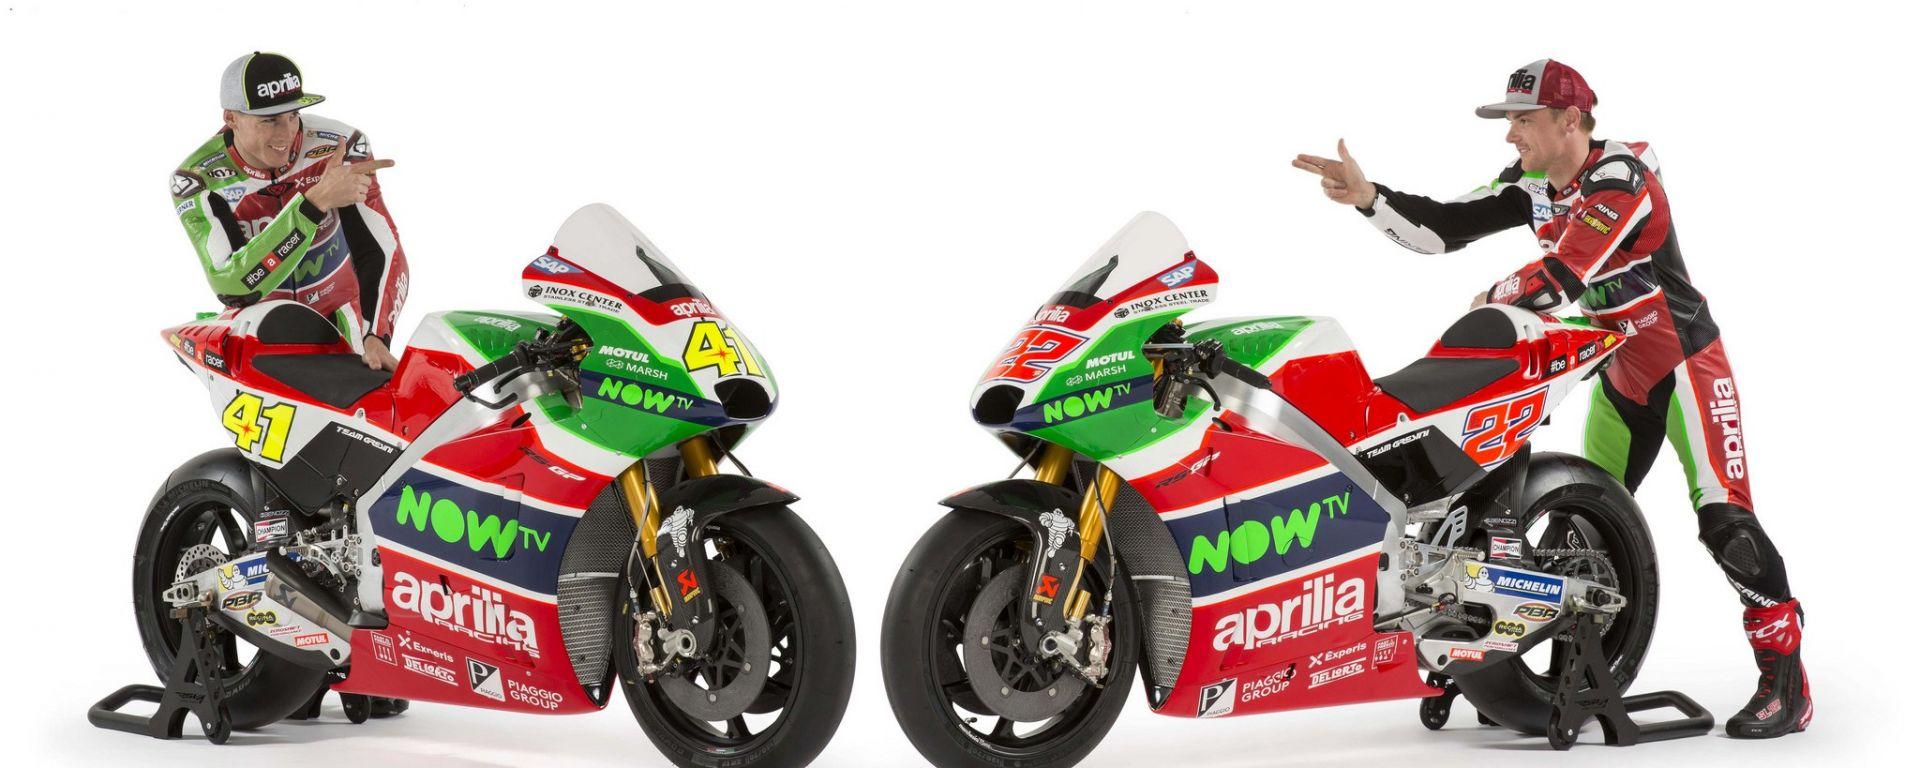 MotoGP 2017: presentato l'Aprilia Racing Team Gresini